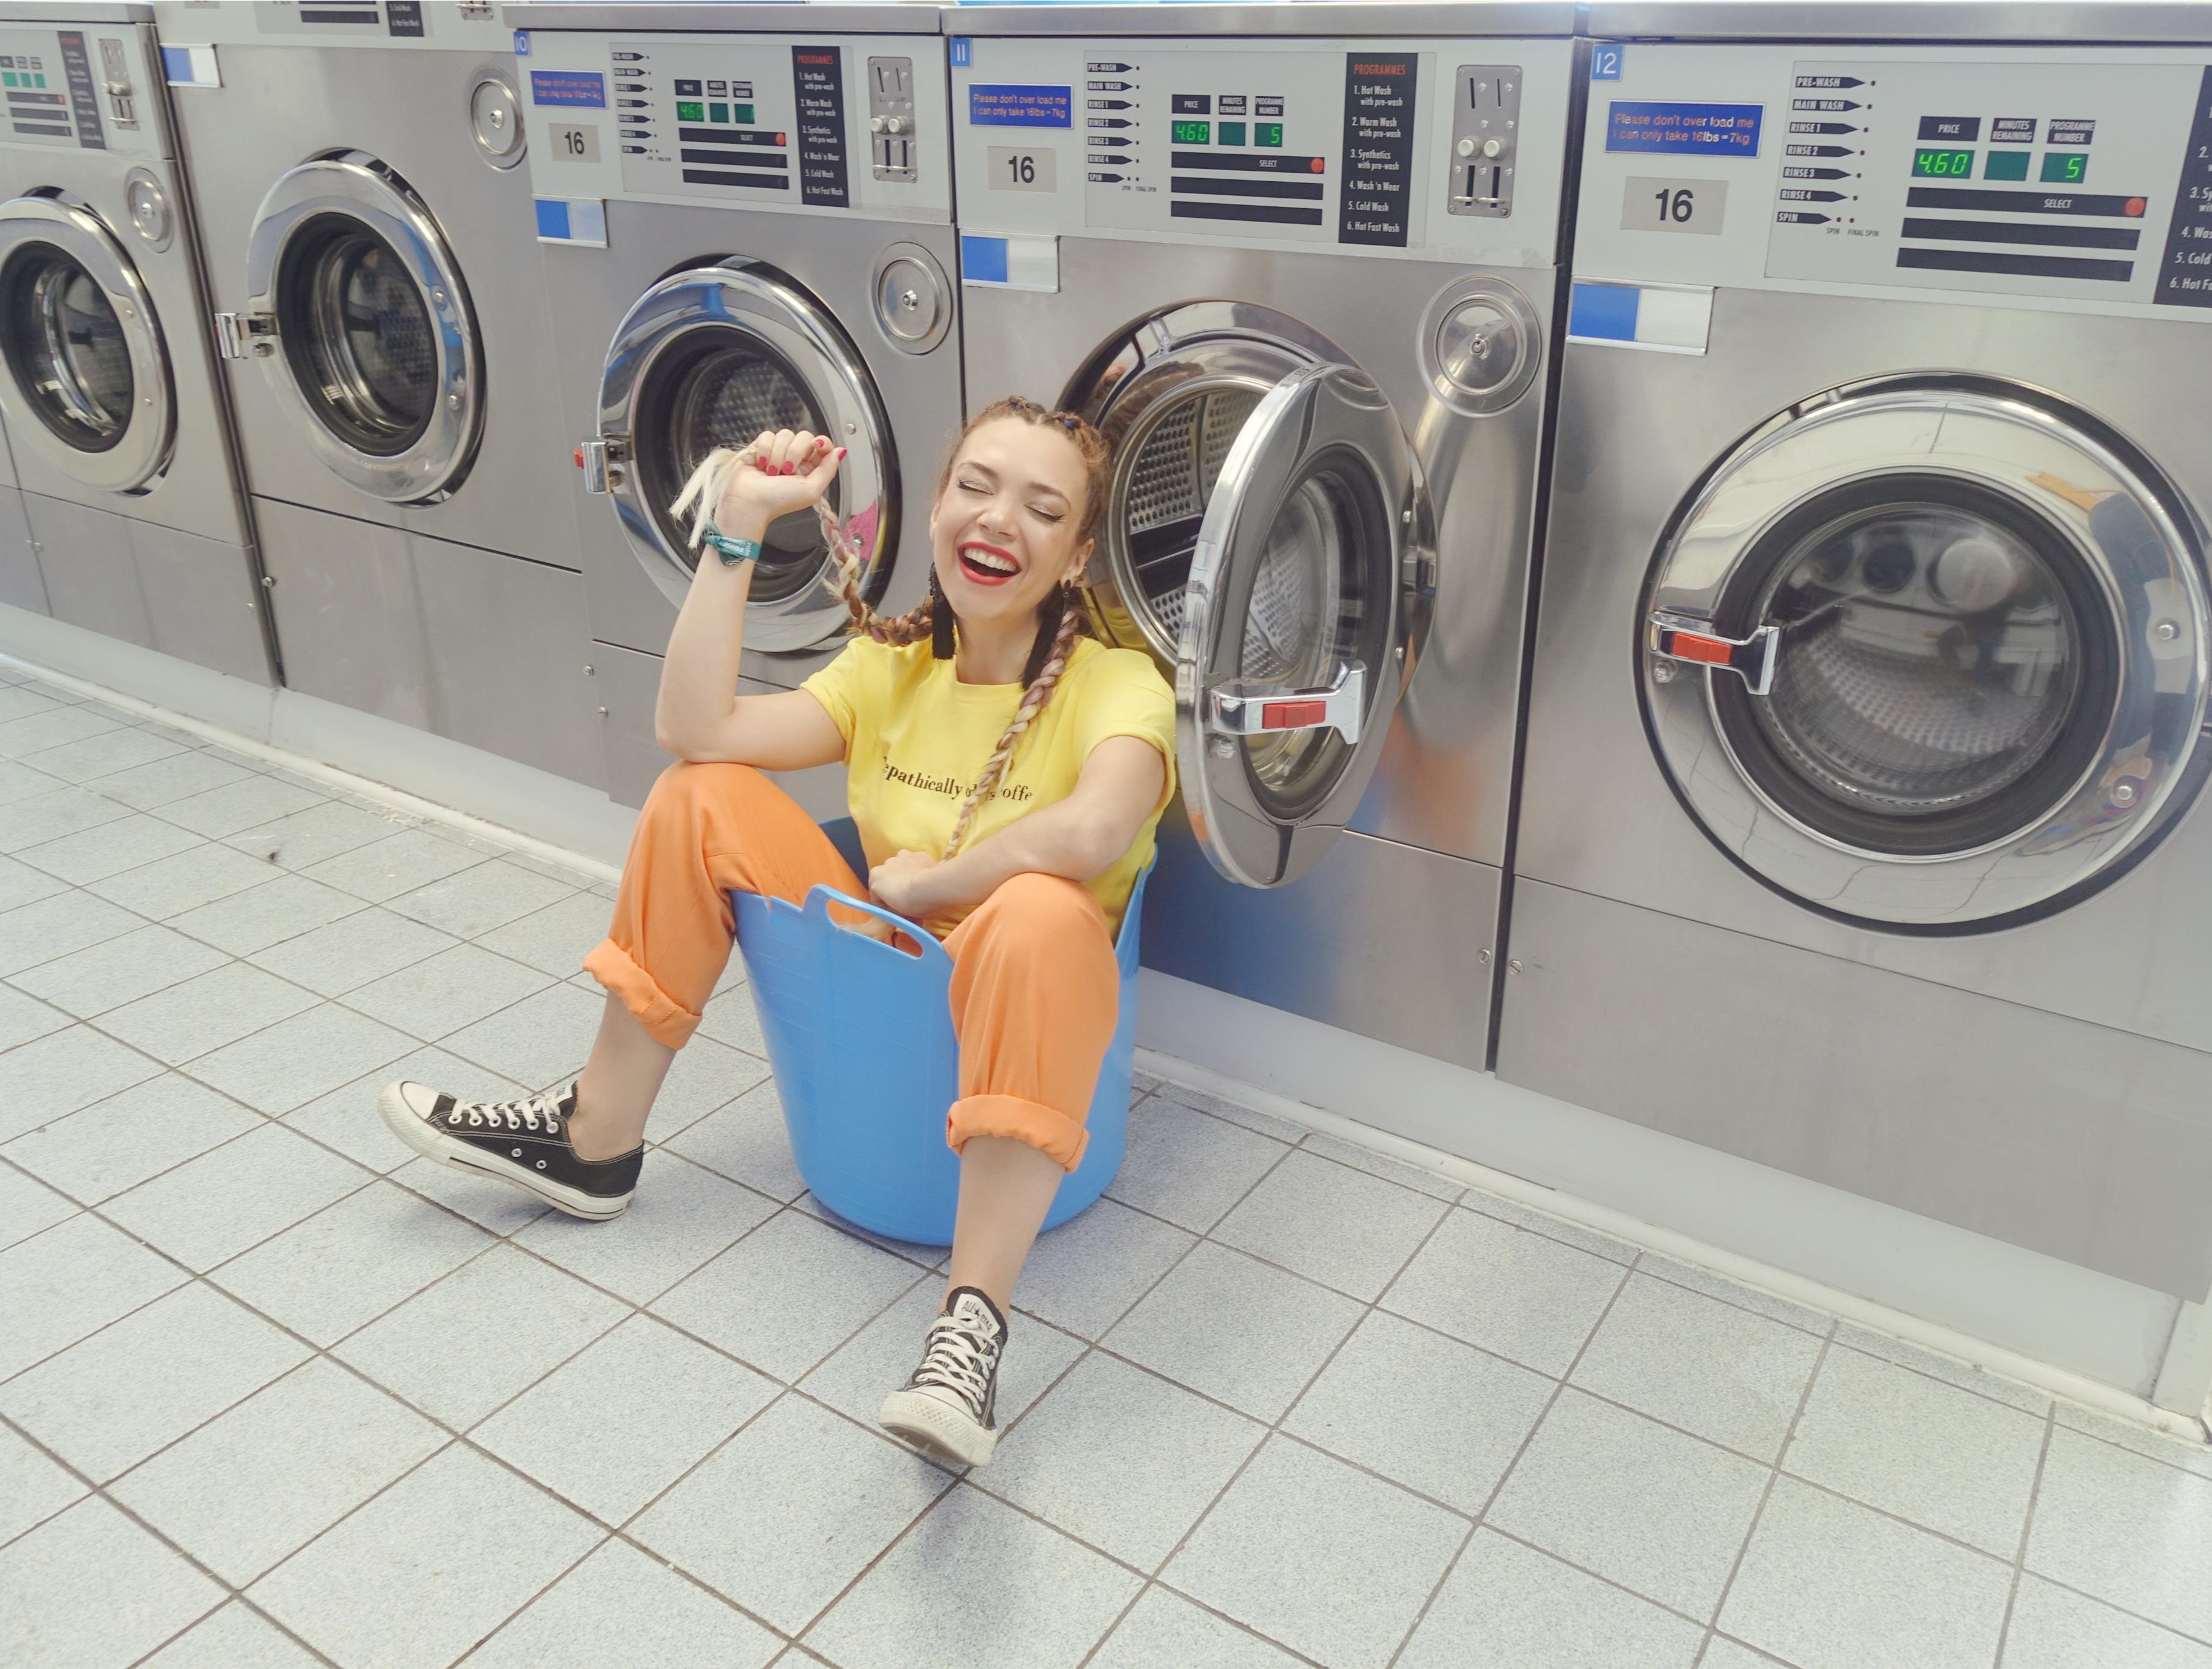 Hipster-laundry-PiensaenChic-influencer-Chicadicta-blog-de-moda-converse-look-brighton-street-style-color-outfit-Chic-adicta-Piensa-en-chic